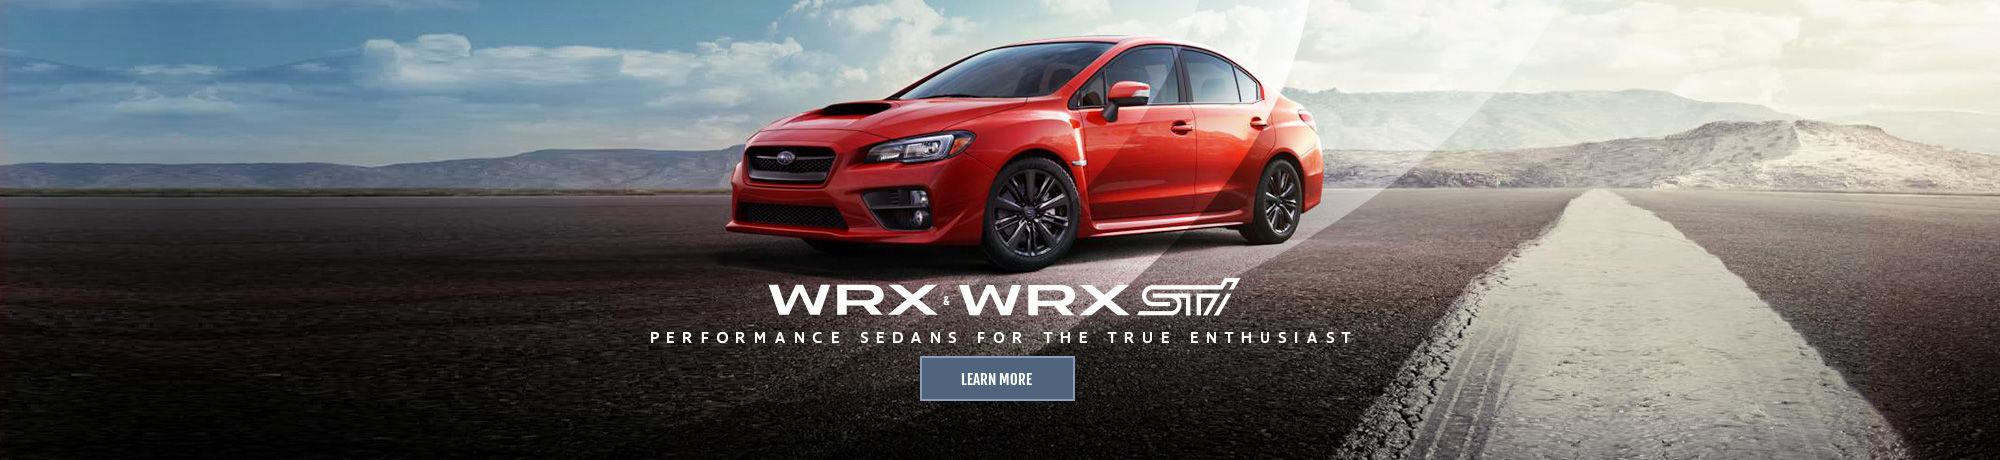 2017 WRX